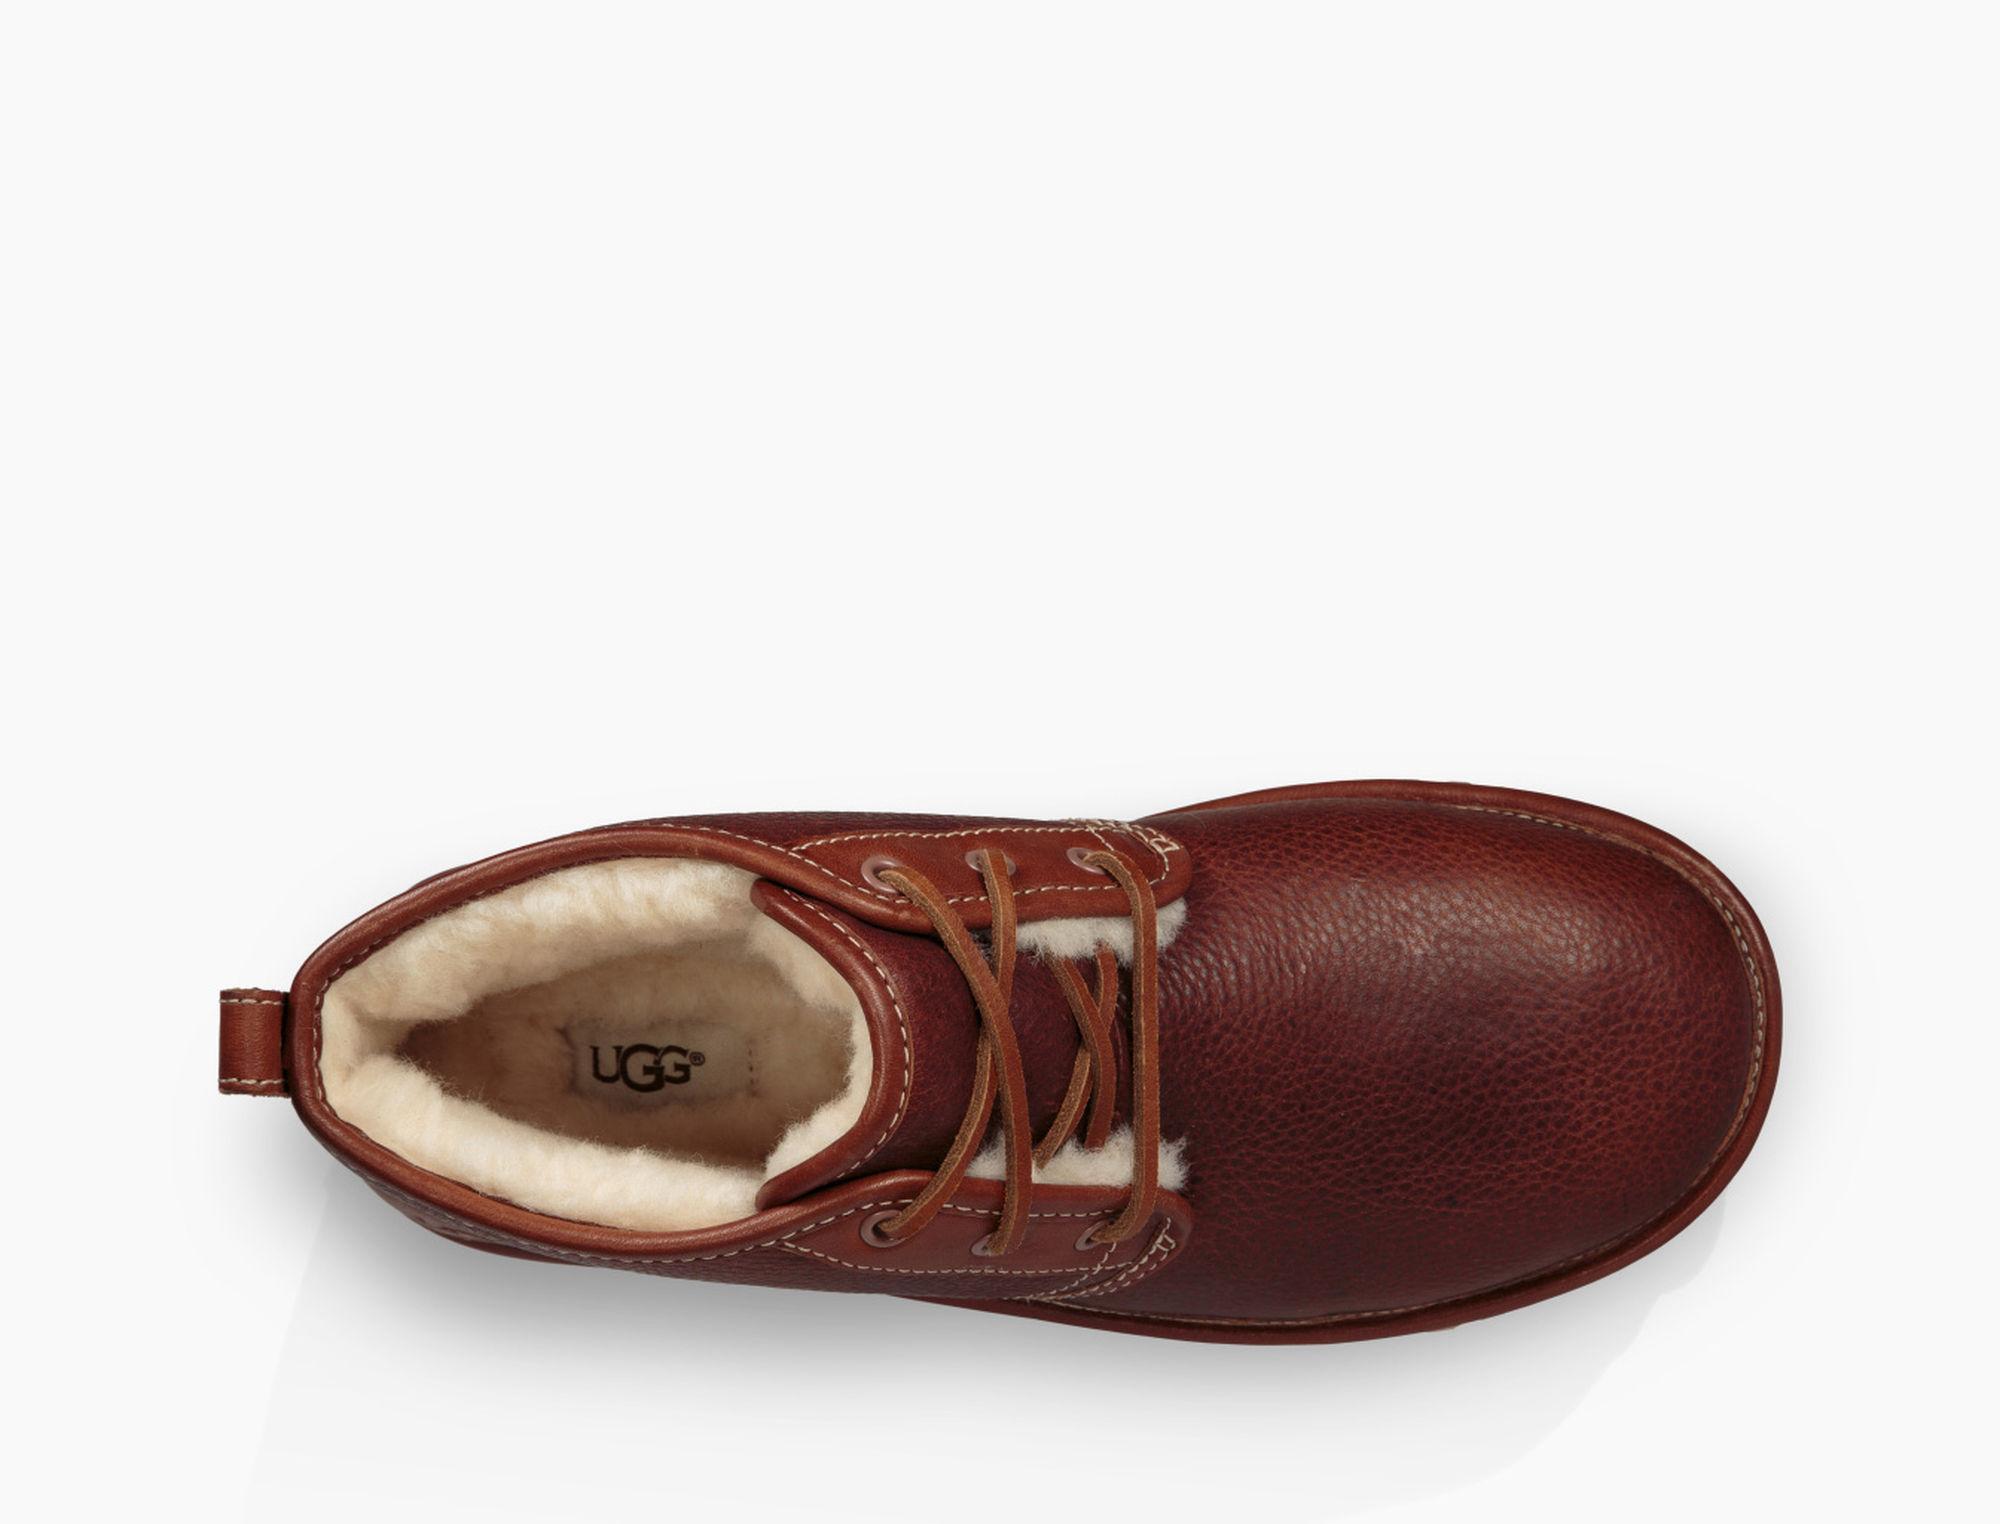 UGG Leather Neumel Boot Neumel Boot